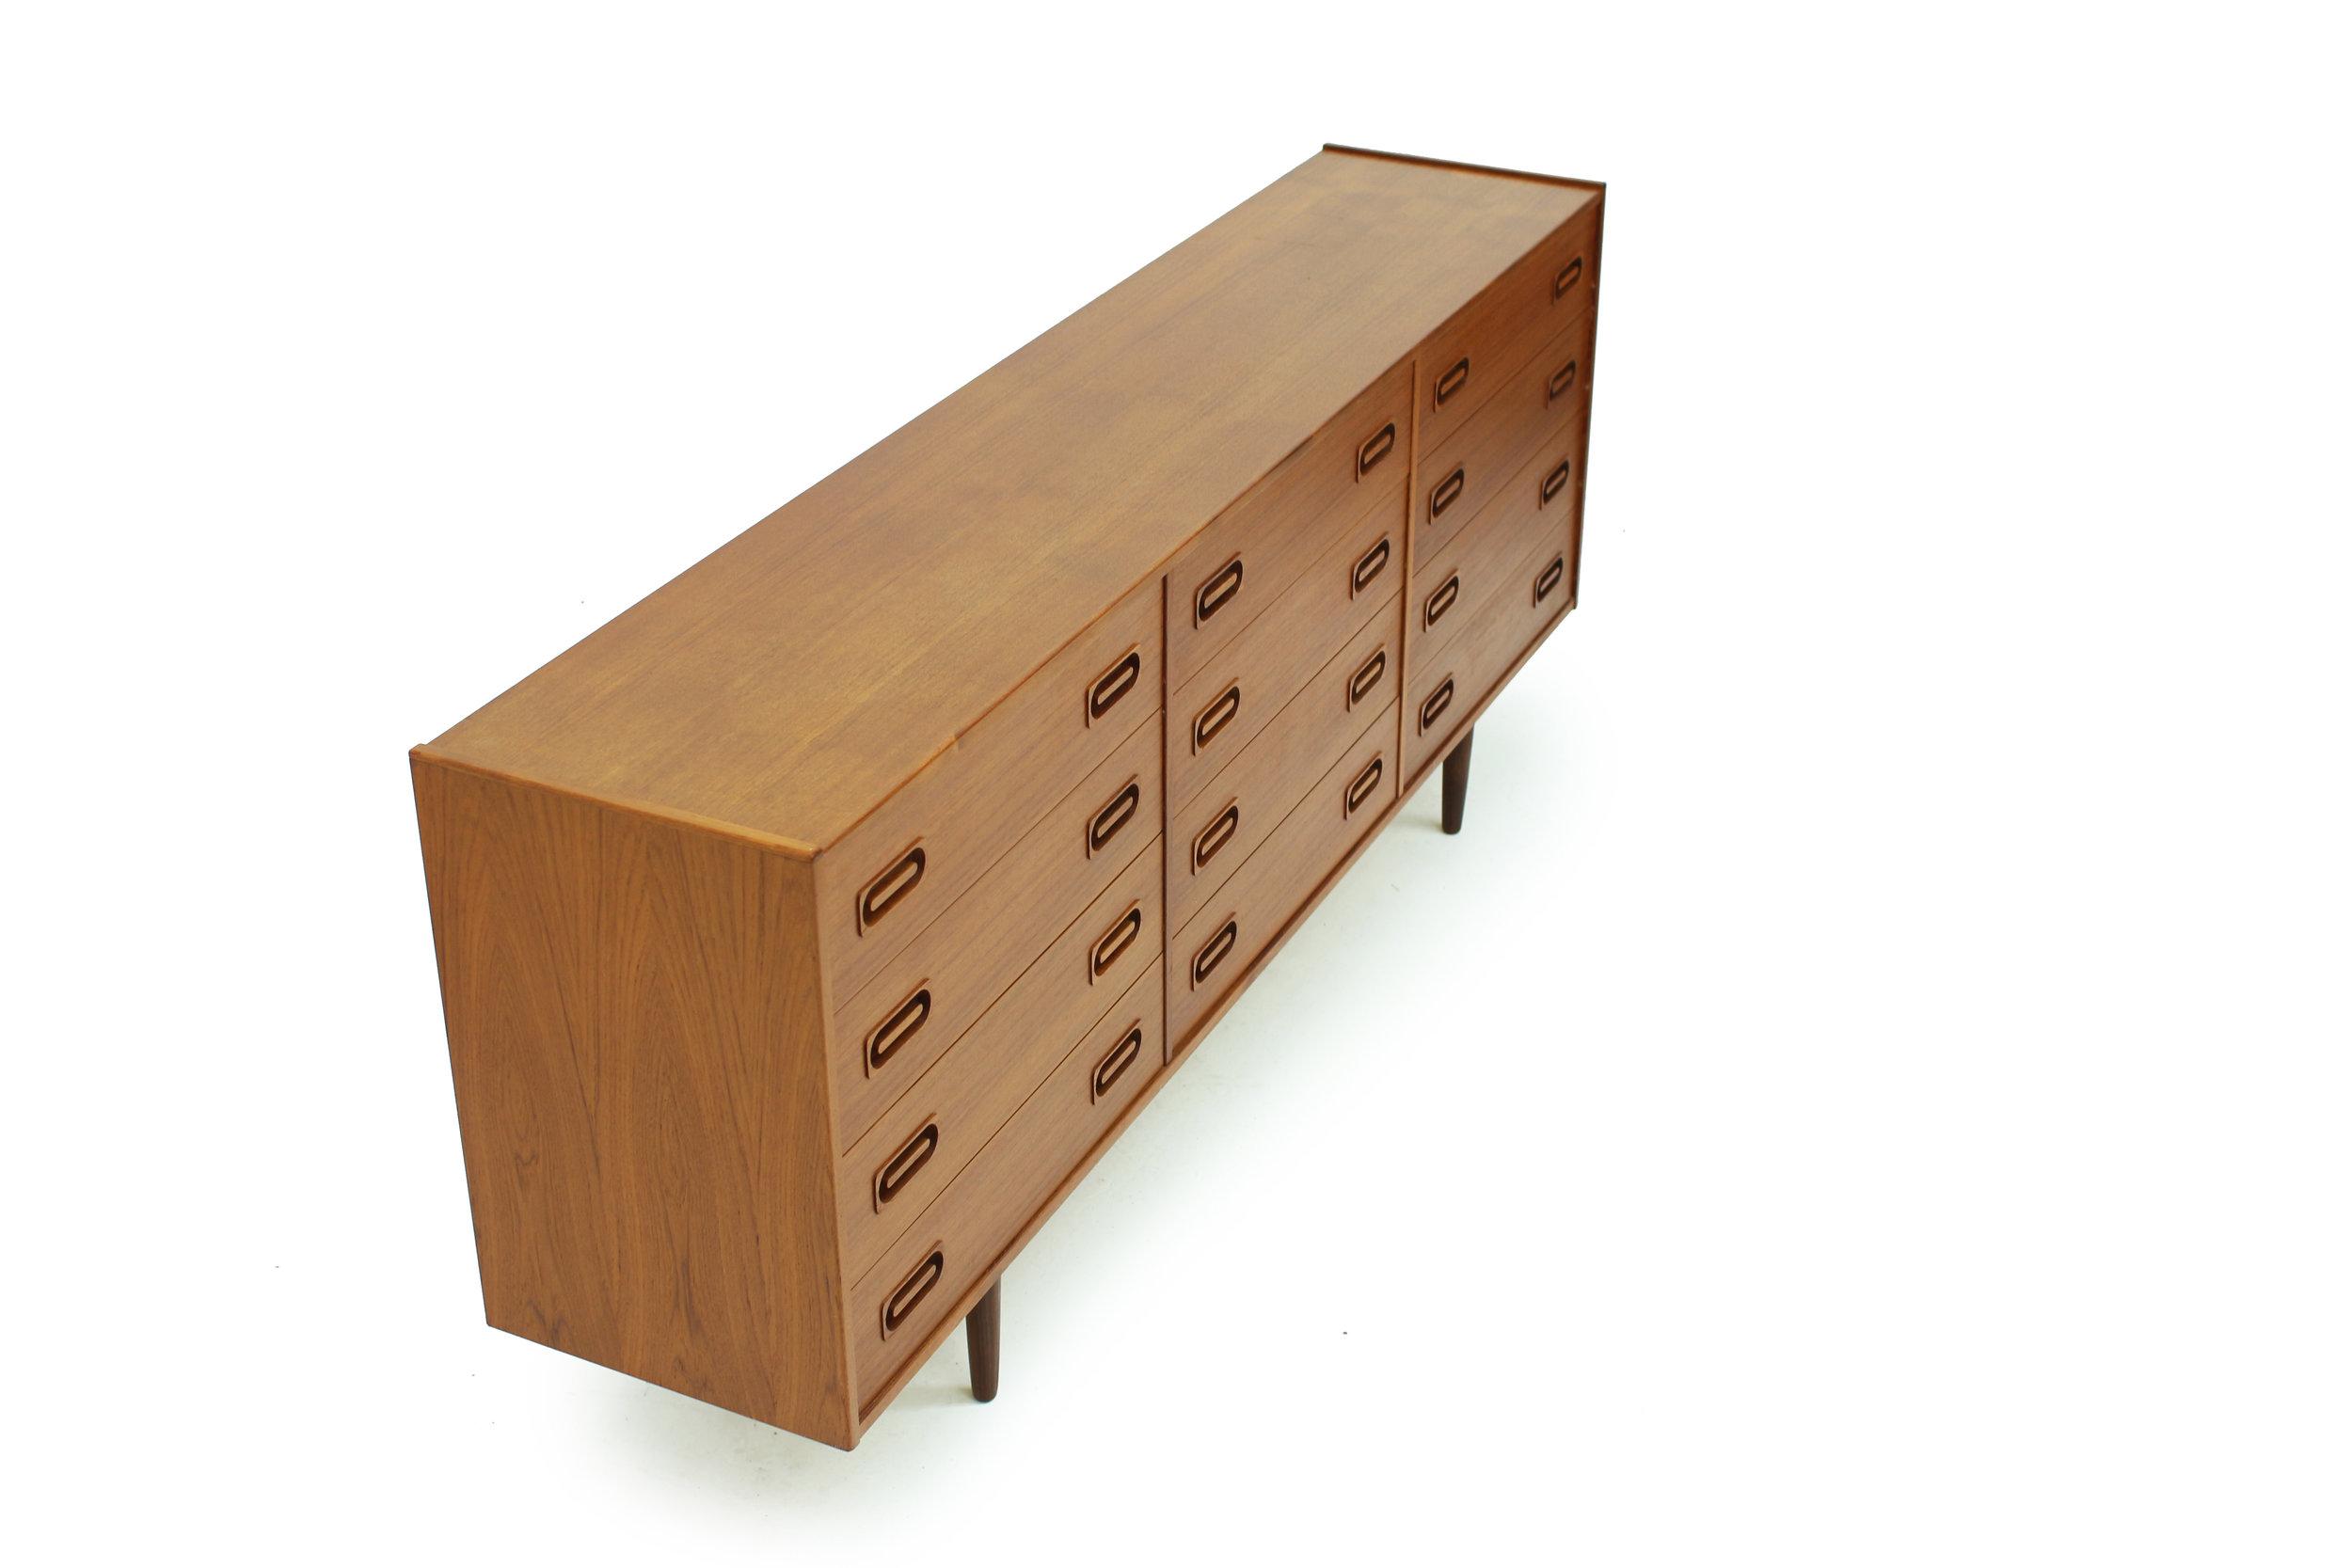 Danish Teak 12 Drawer Dresser by Dyrlund (3).jpg